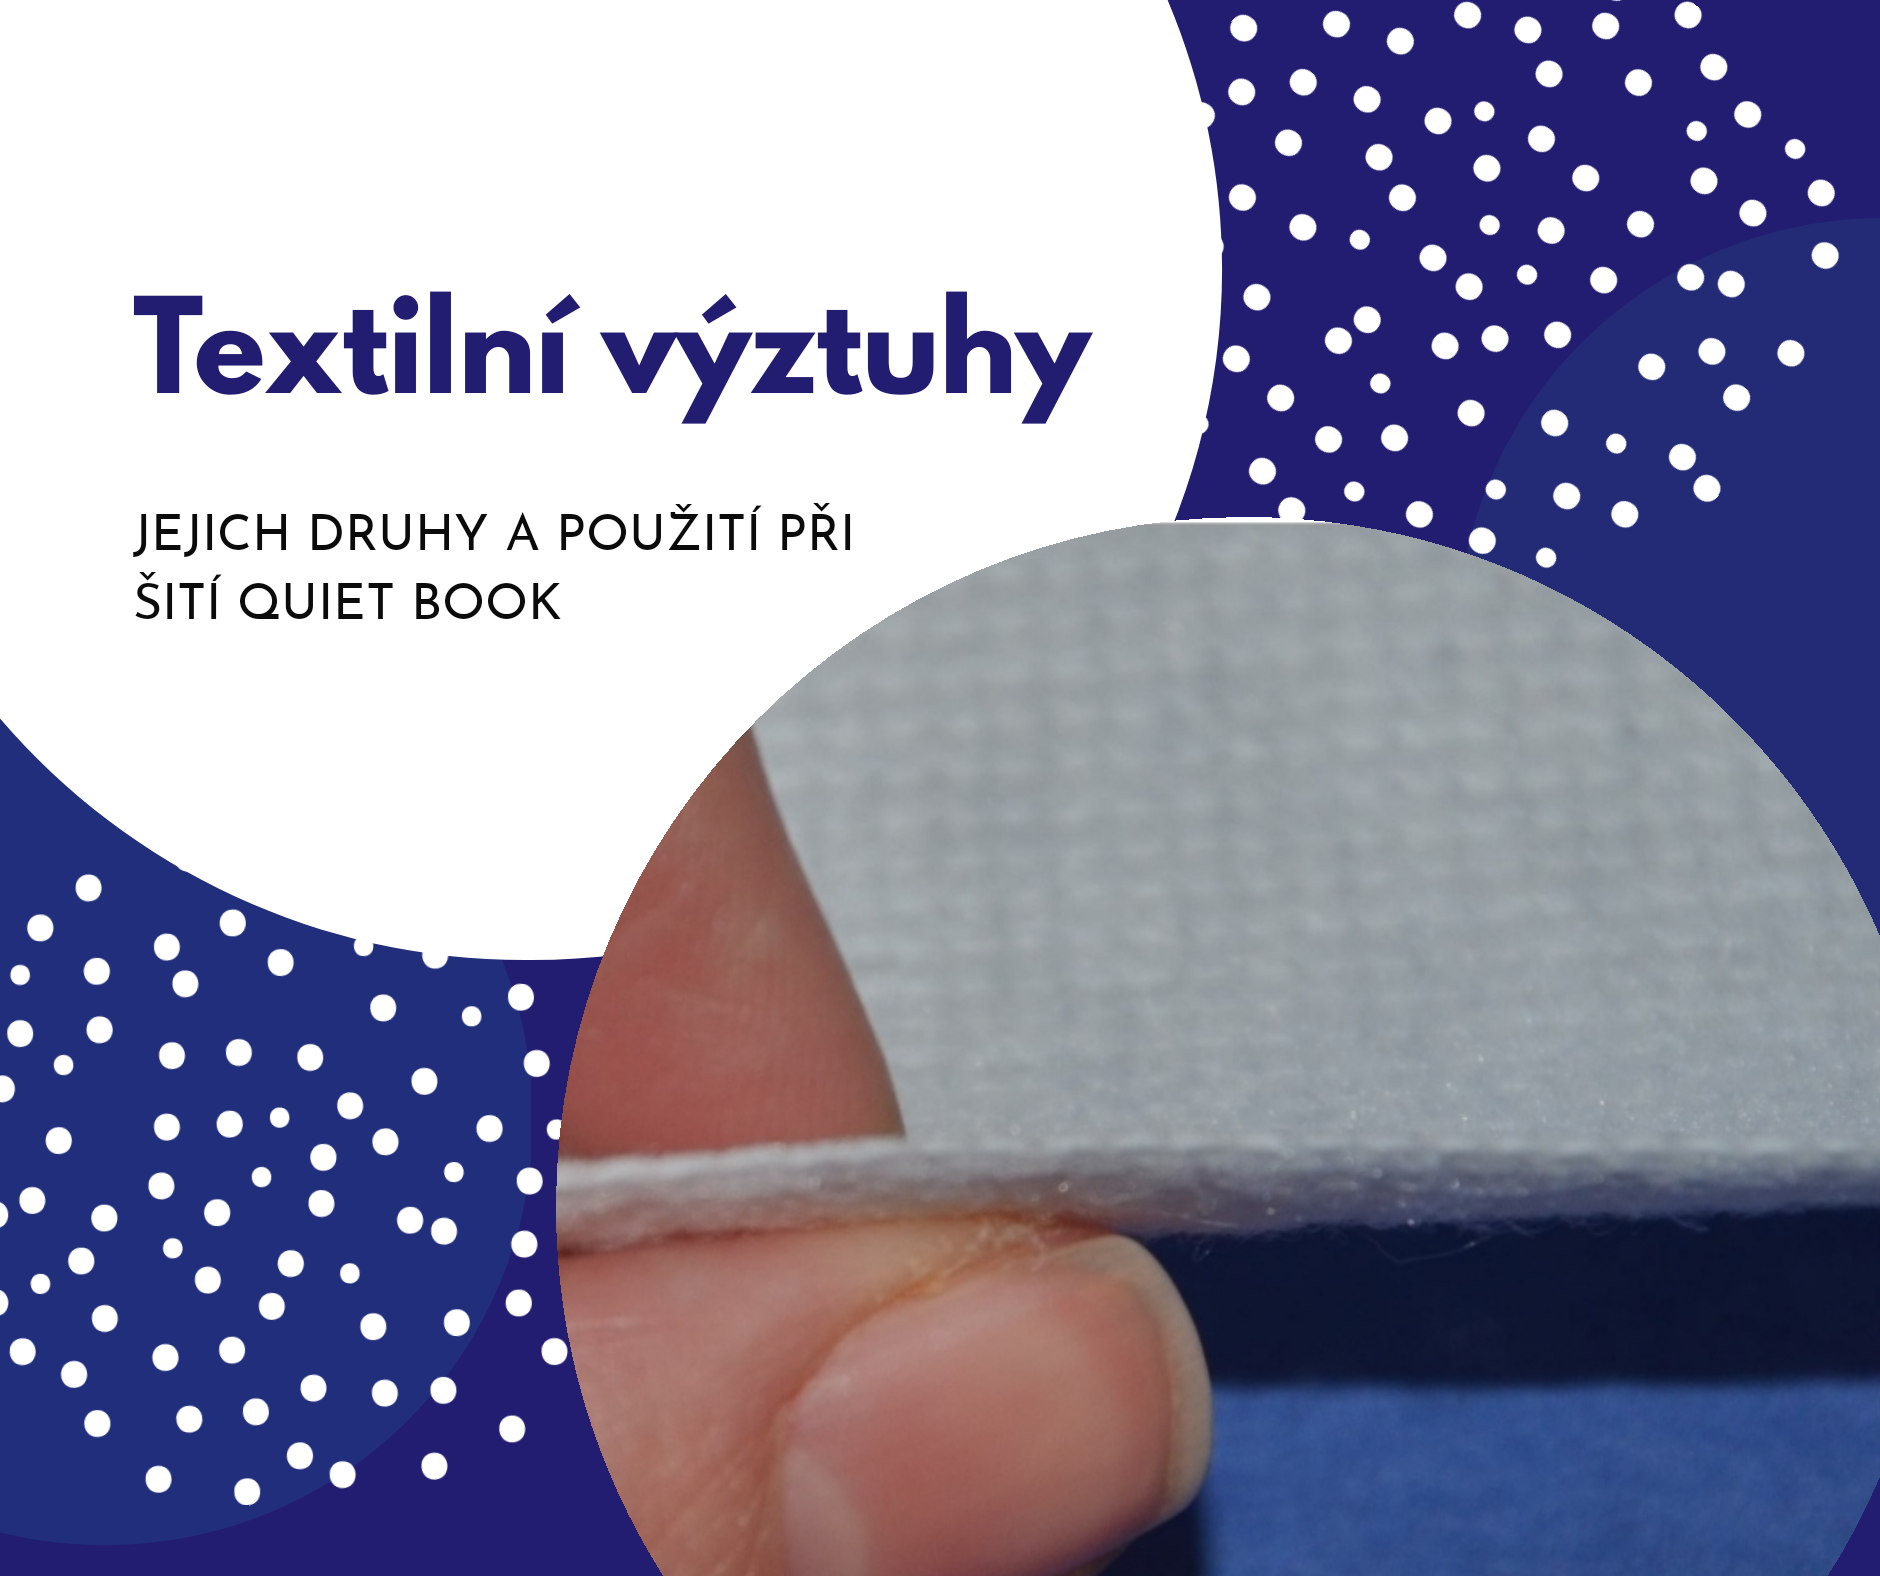 Textilní výtztuhy vhodné pro quiet book